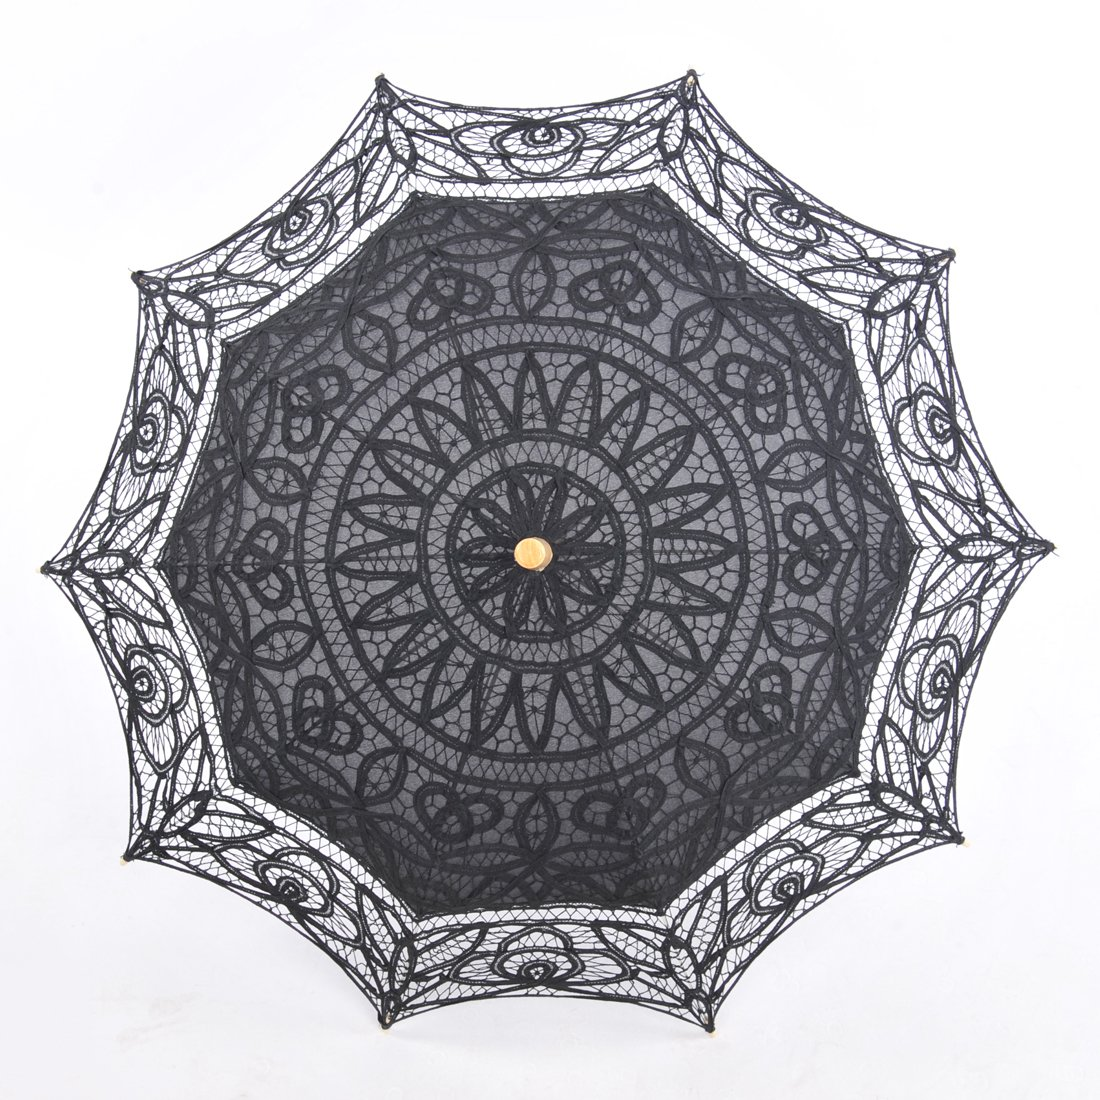 Topwedding Battenburg Lace Outdoor Wedding Parasol Bridal Shower Umbrella, Black